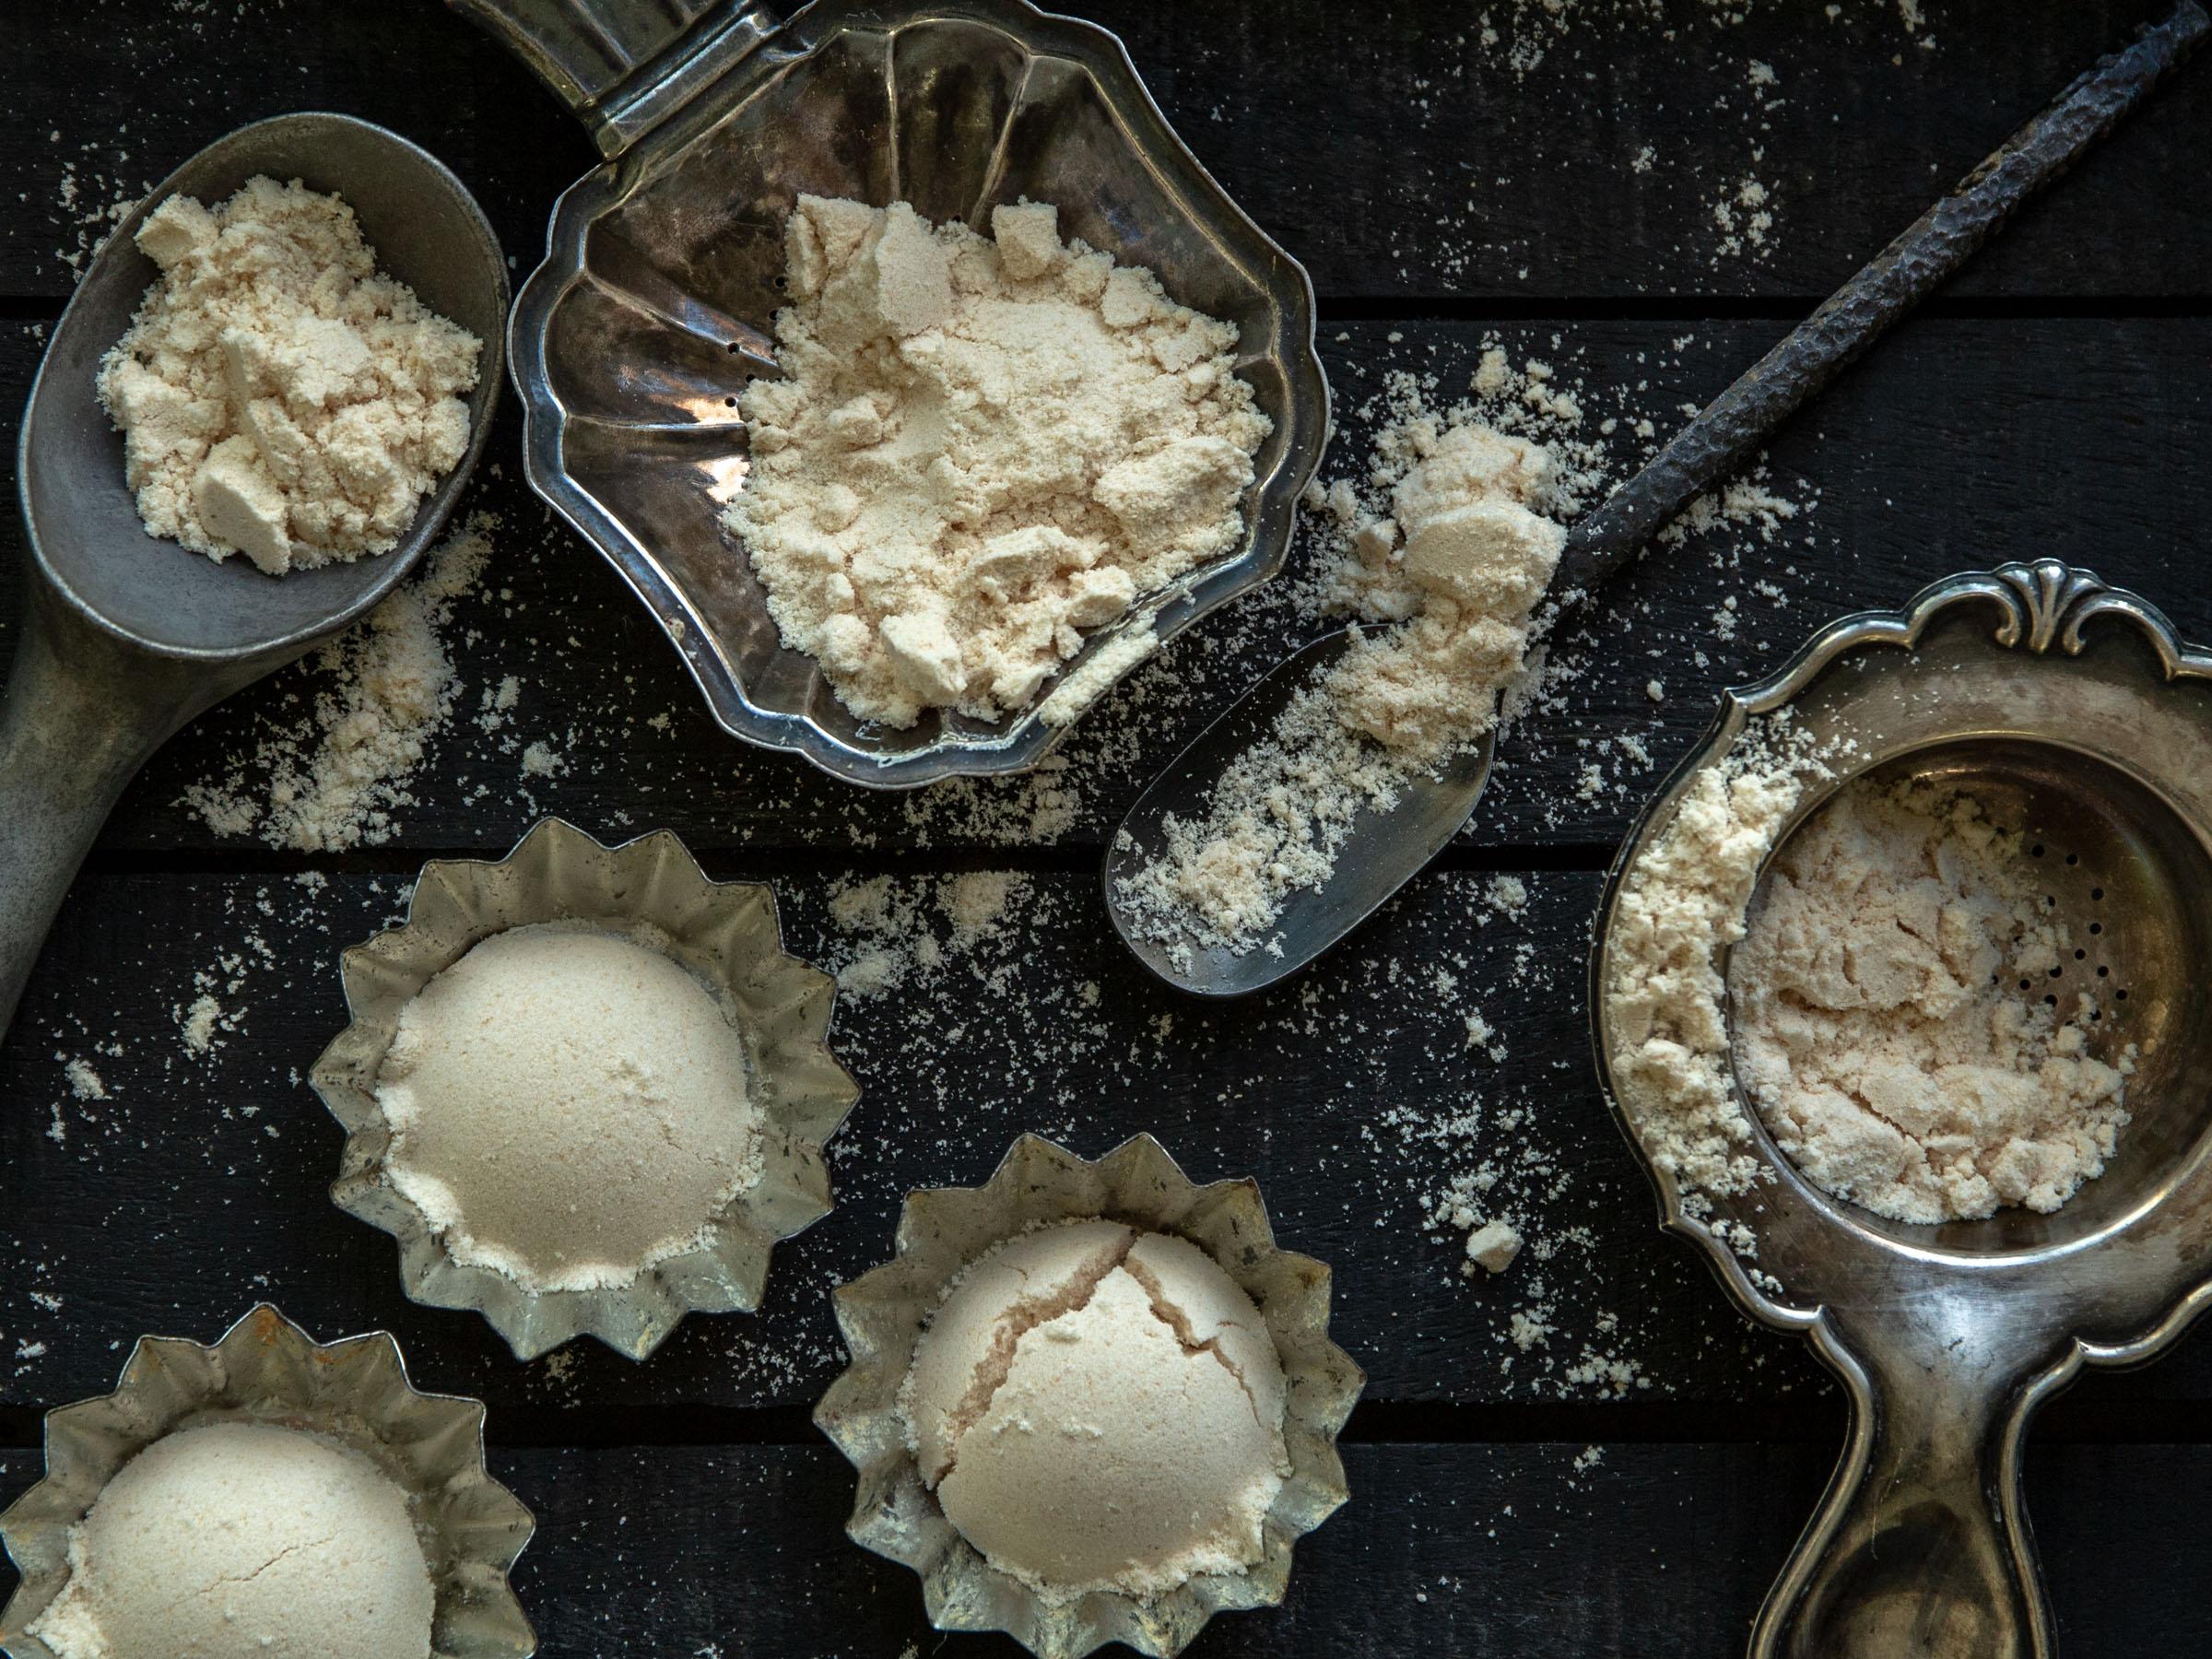 raw vegan recipes with coconut flour